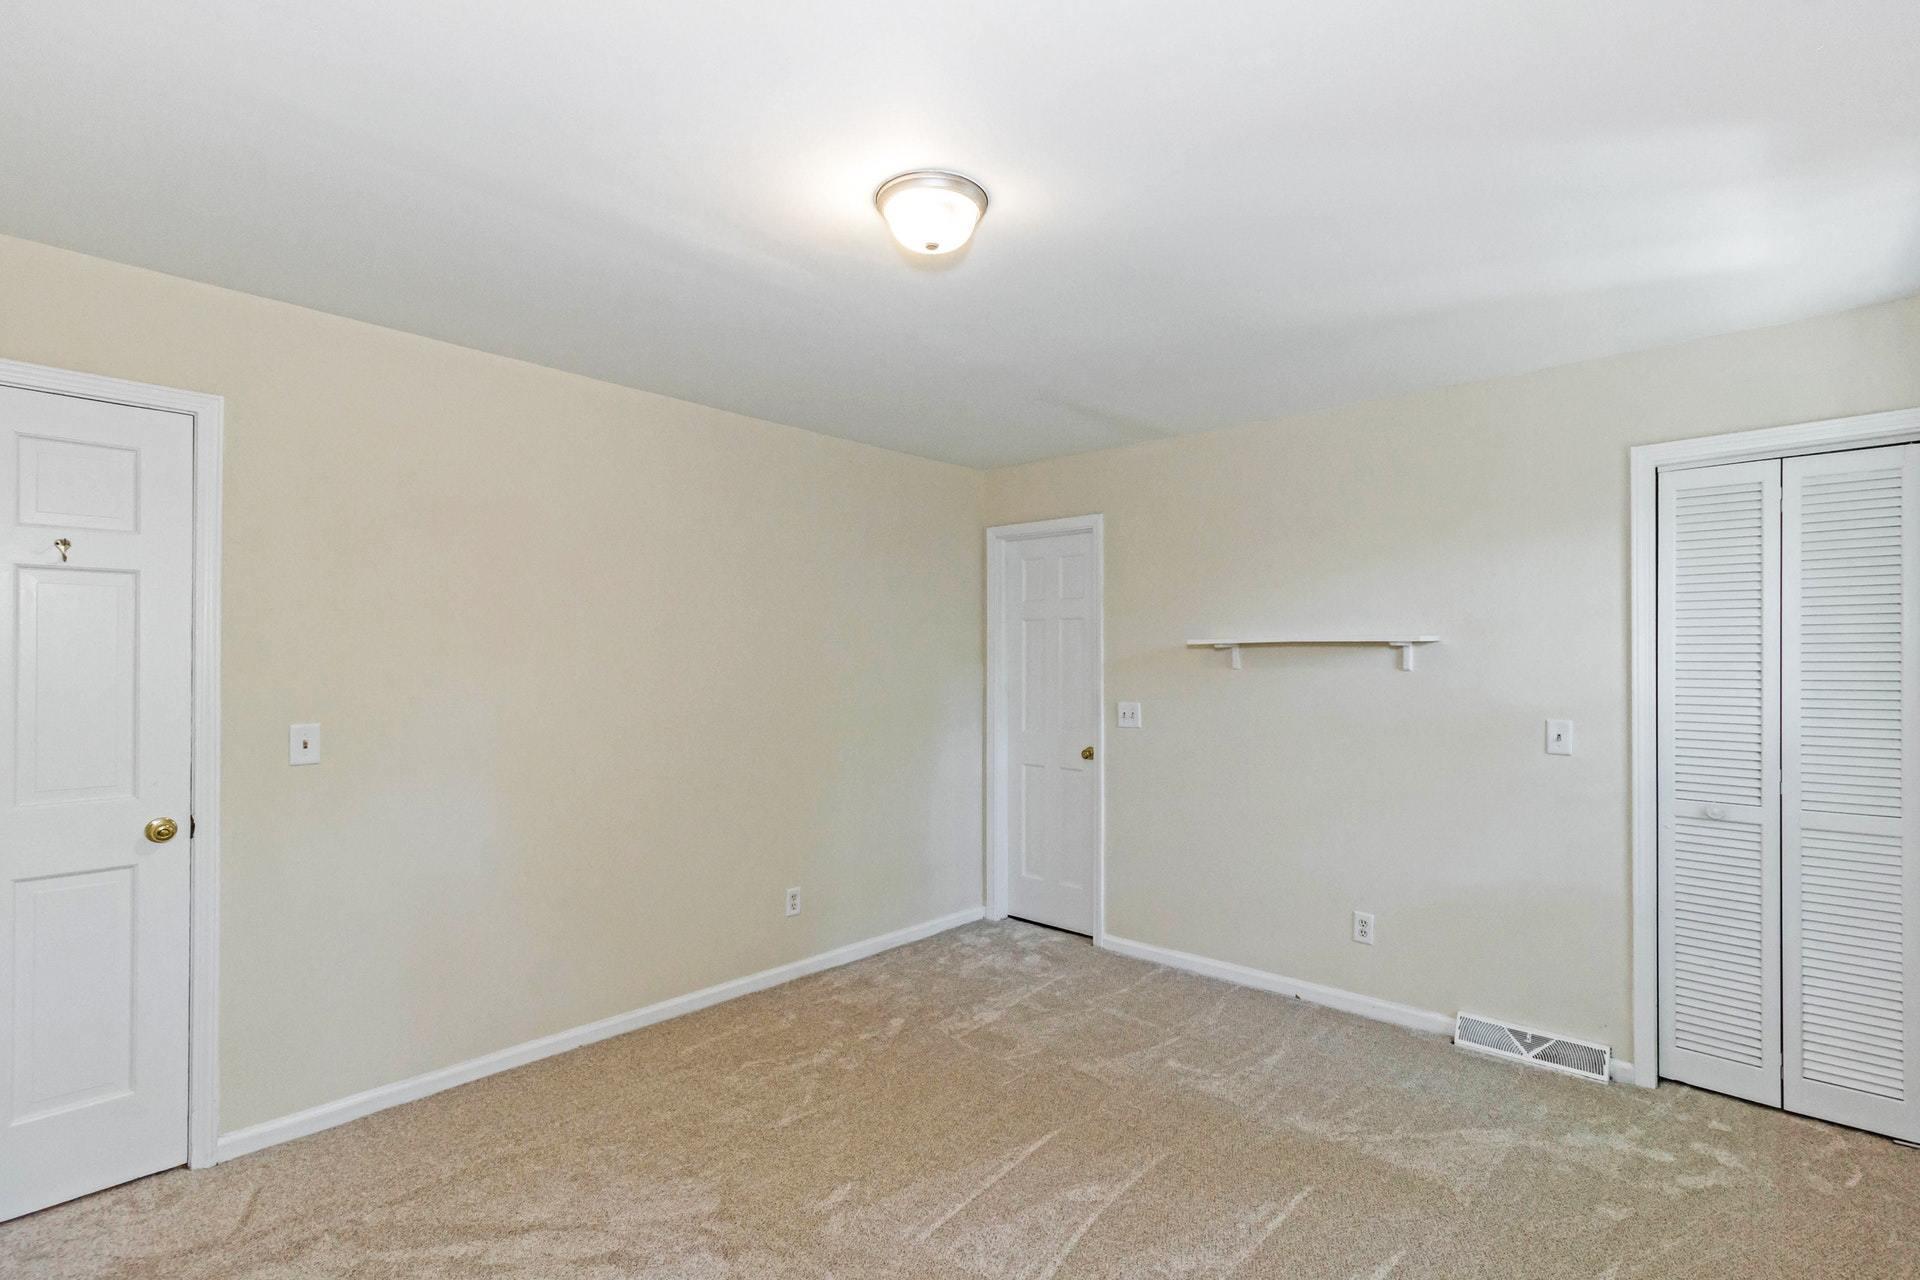 Shemwood II Homes For Sale - 969 Sea Gull, Mount Pleasant, SC - 12